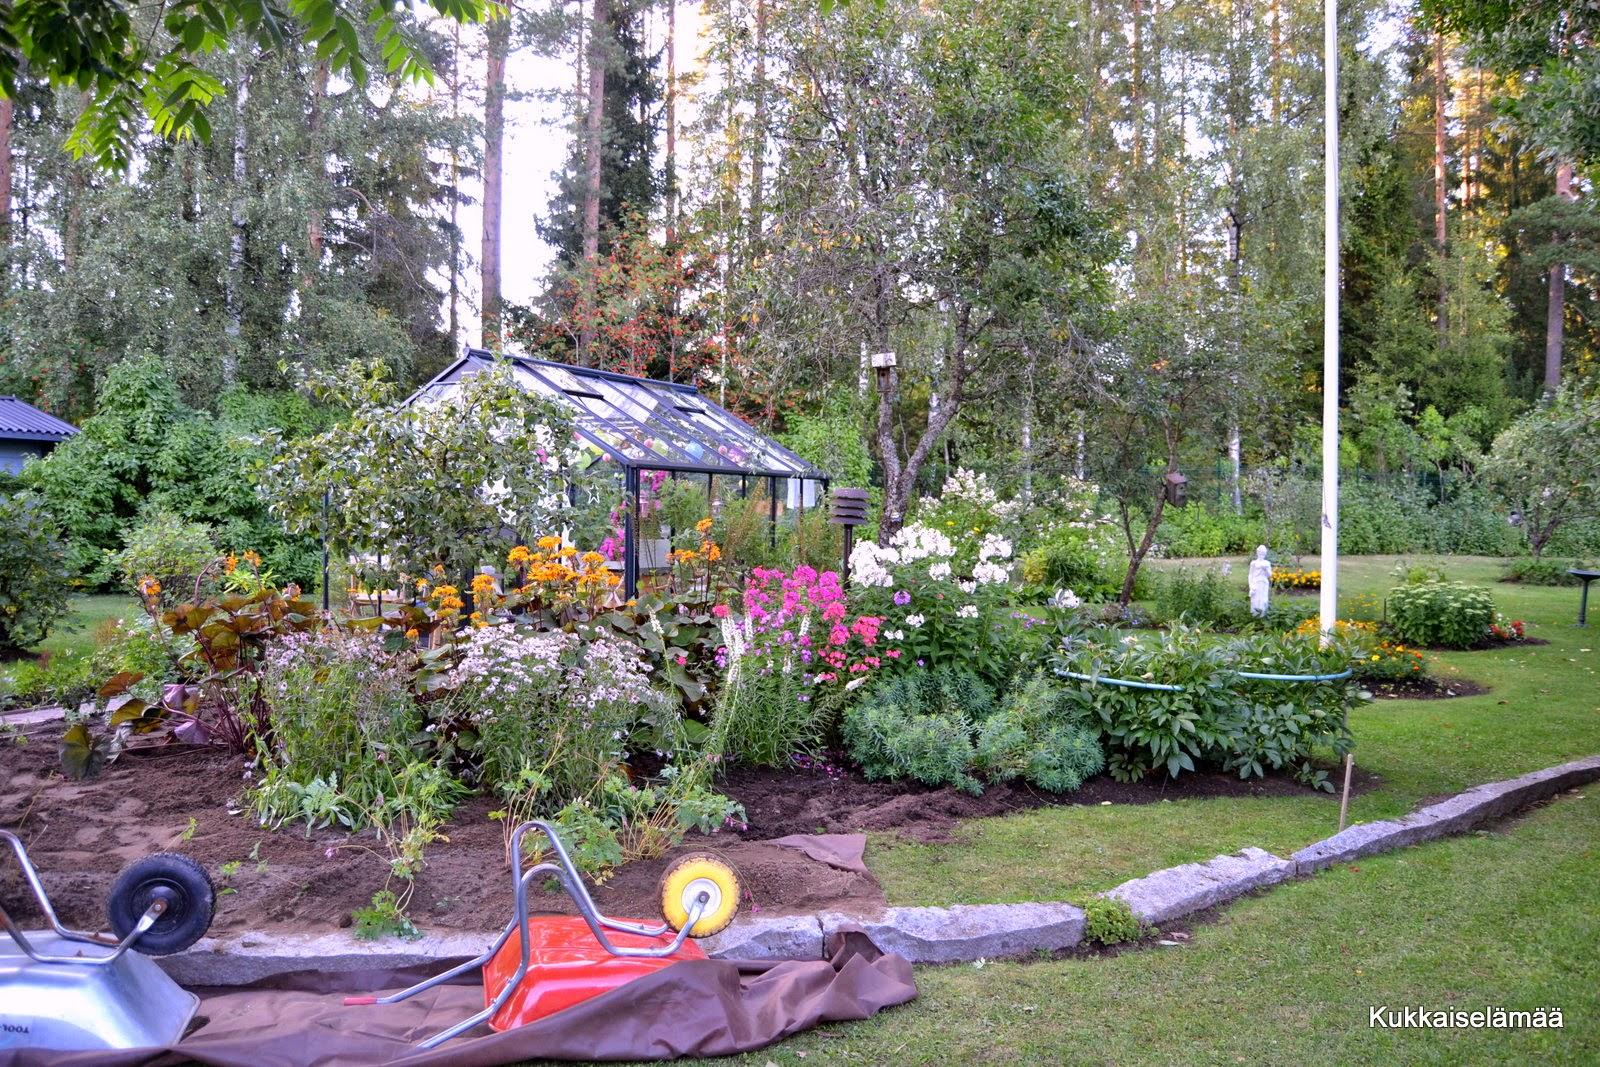 Tuumasta toimeen! – Garden project began